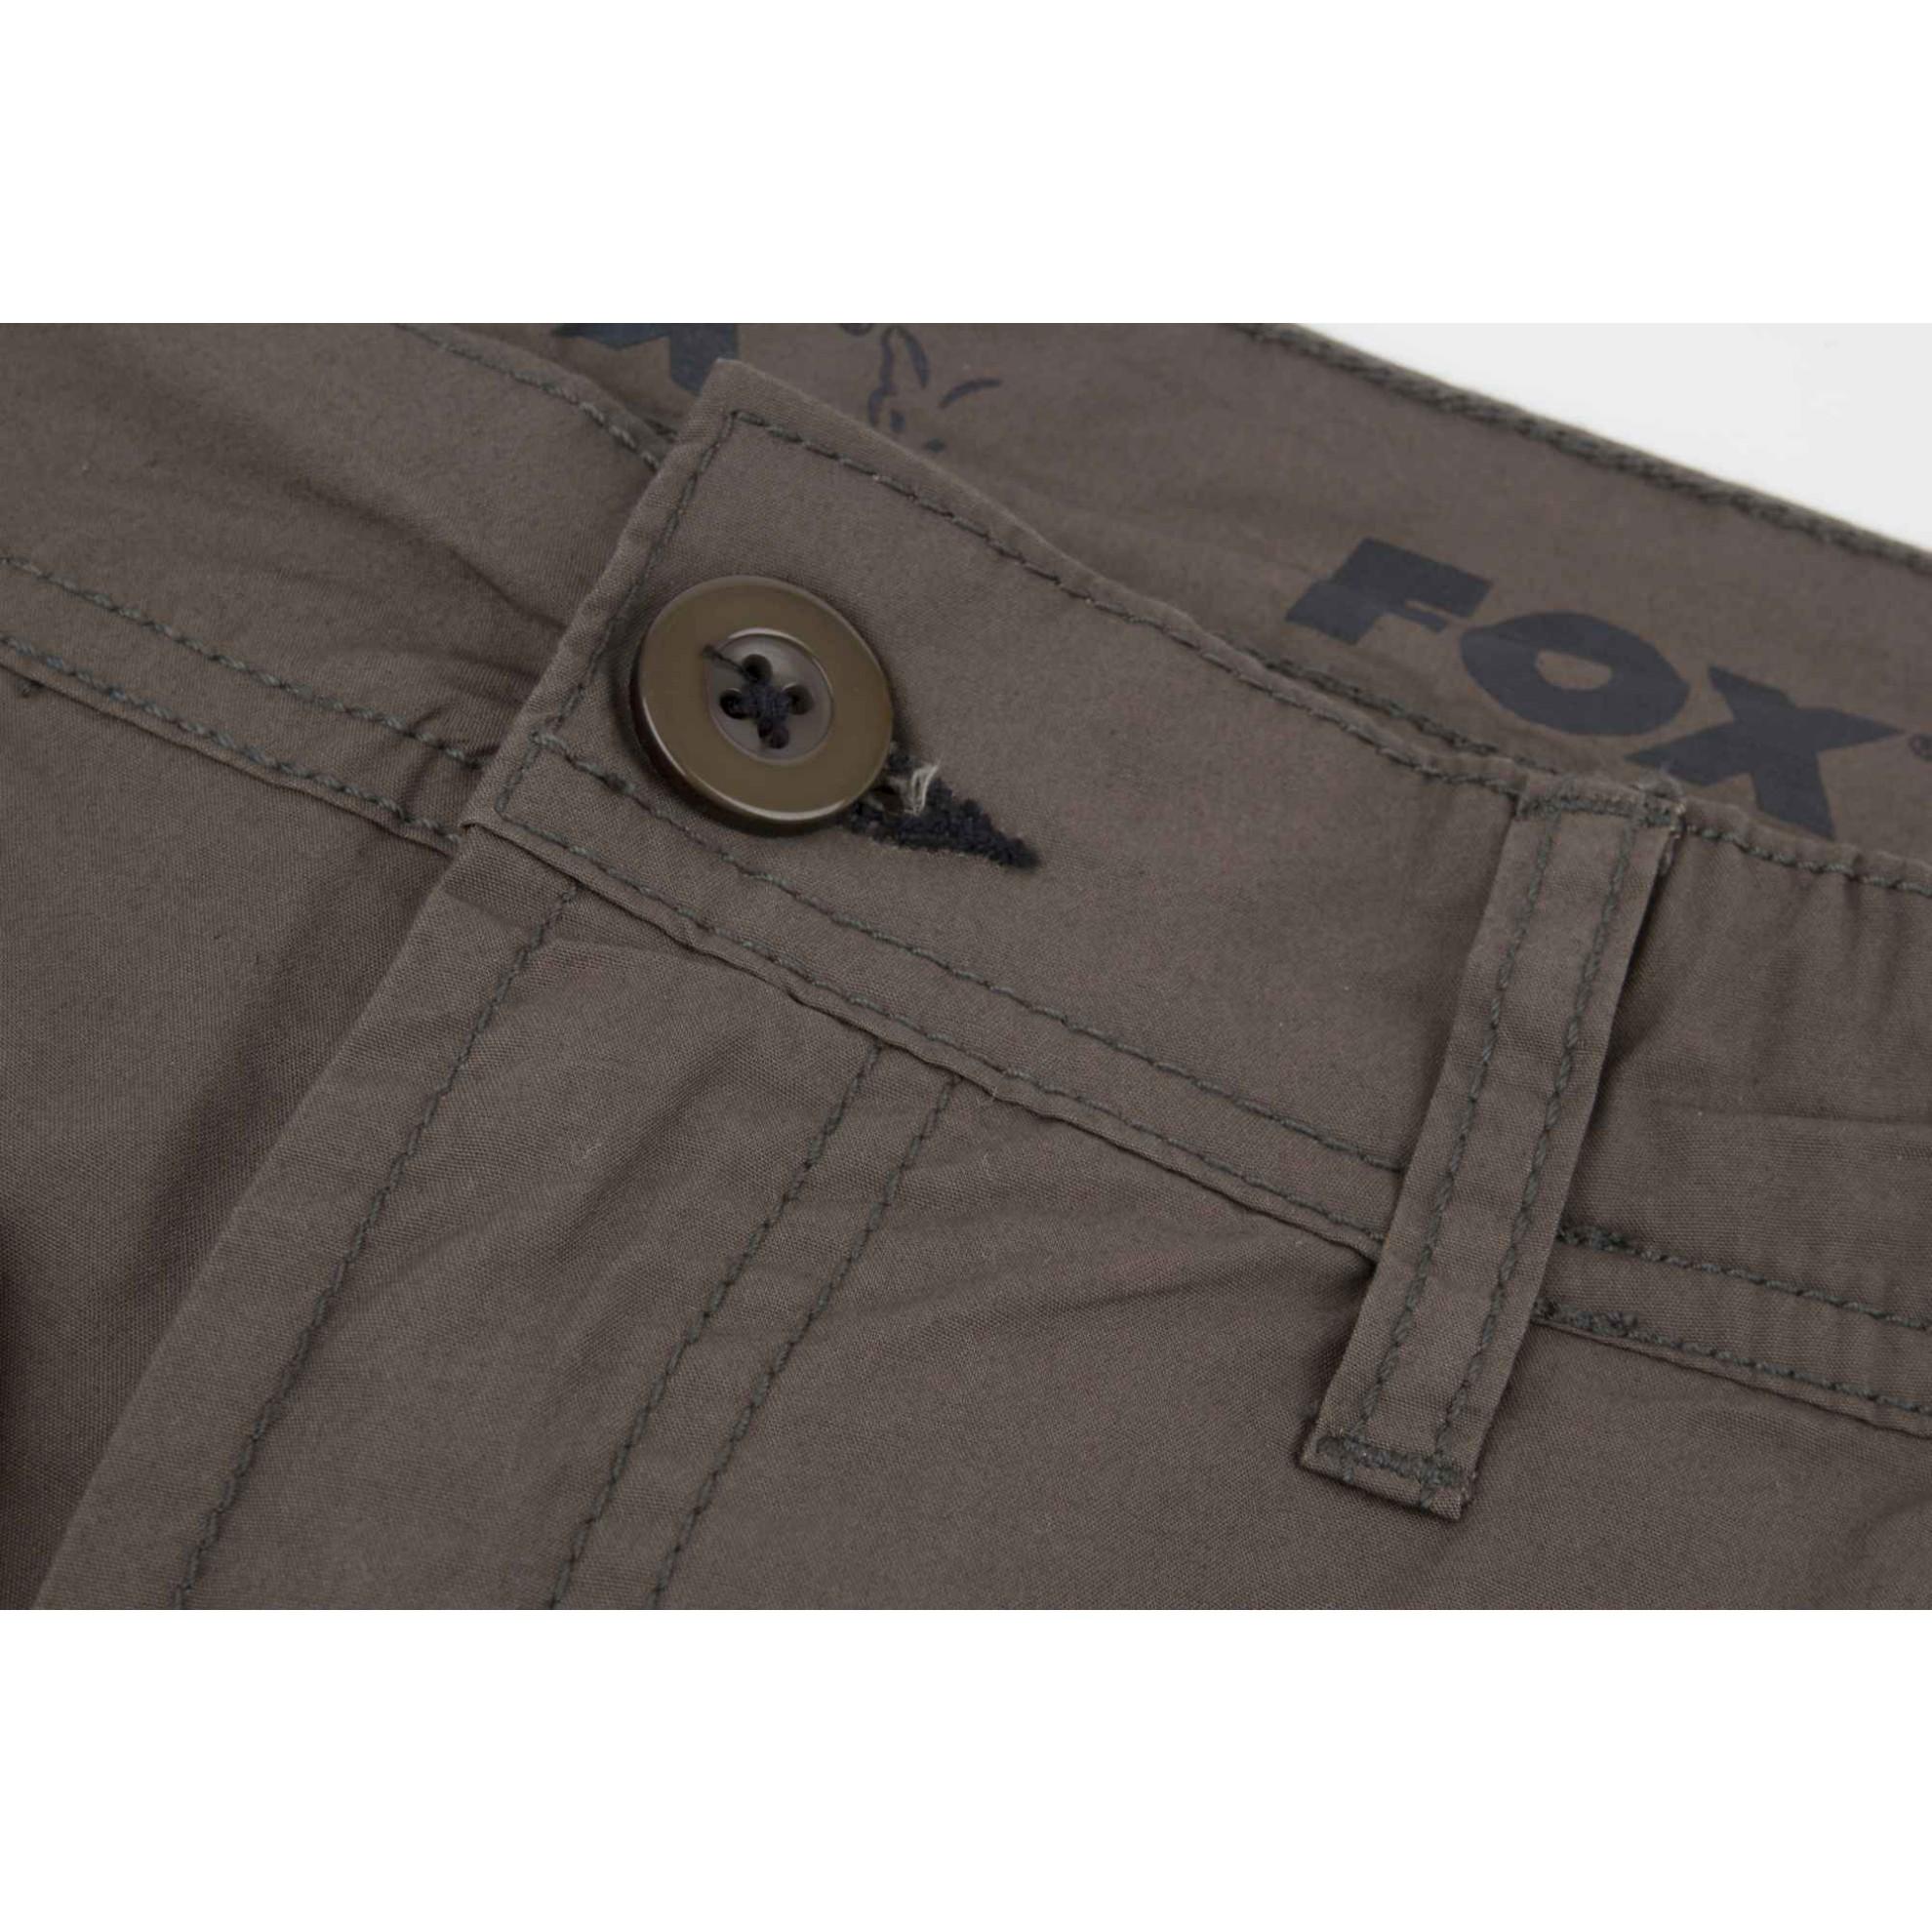 Fox Lightweight Cargo Shorts